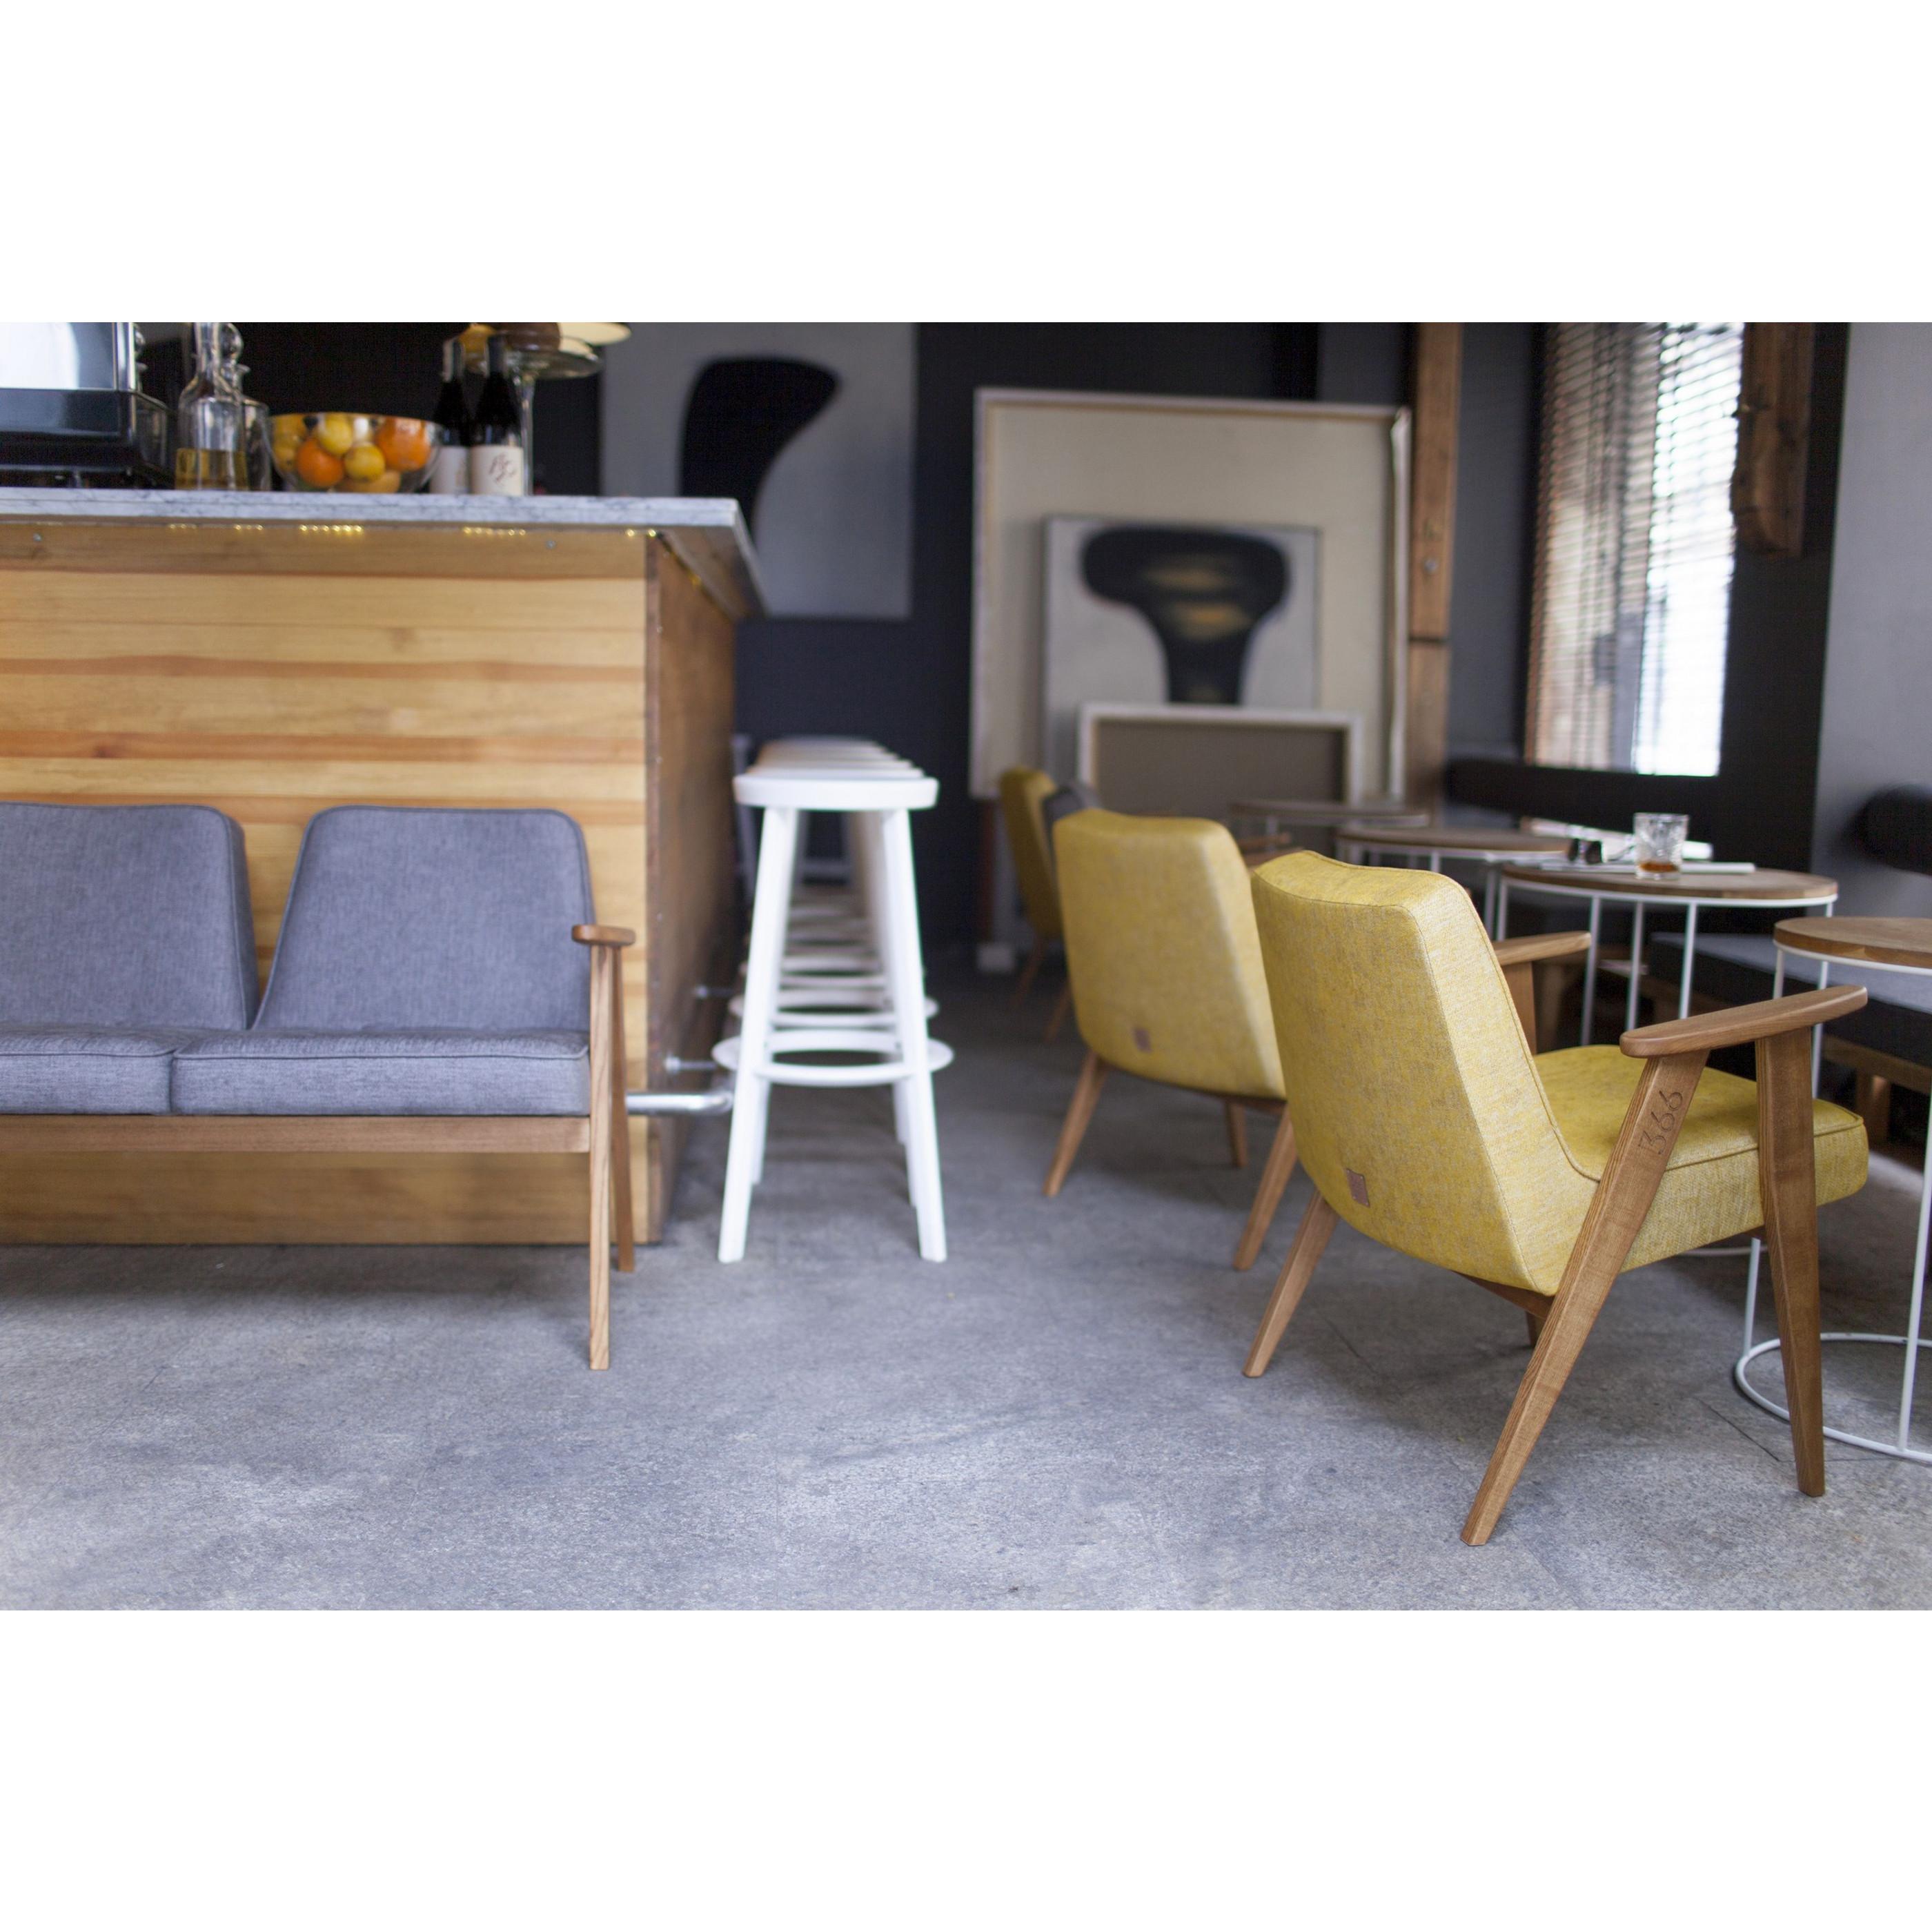 2 Seater Sofa 366 Loft | Mustard